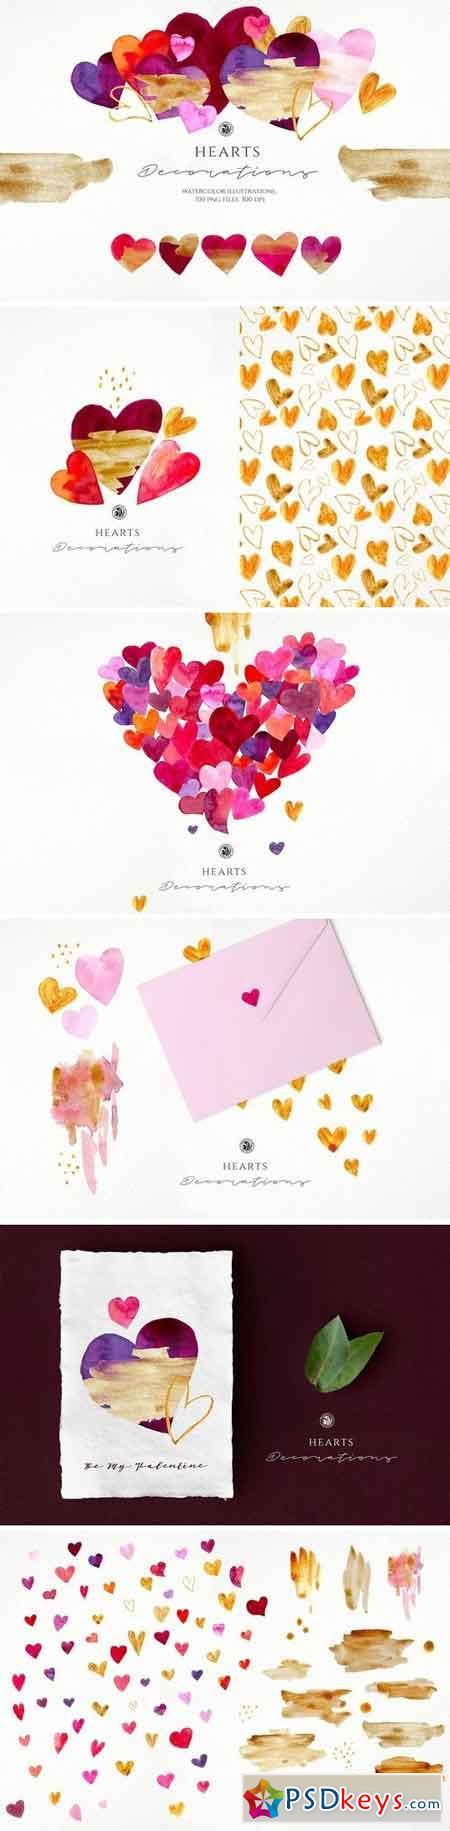 Hearts - watercolor illustrations 3221567